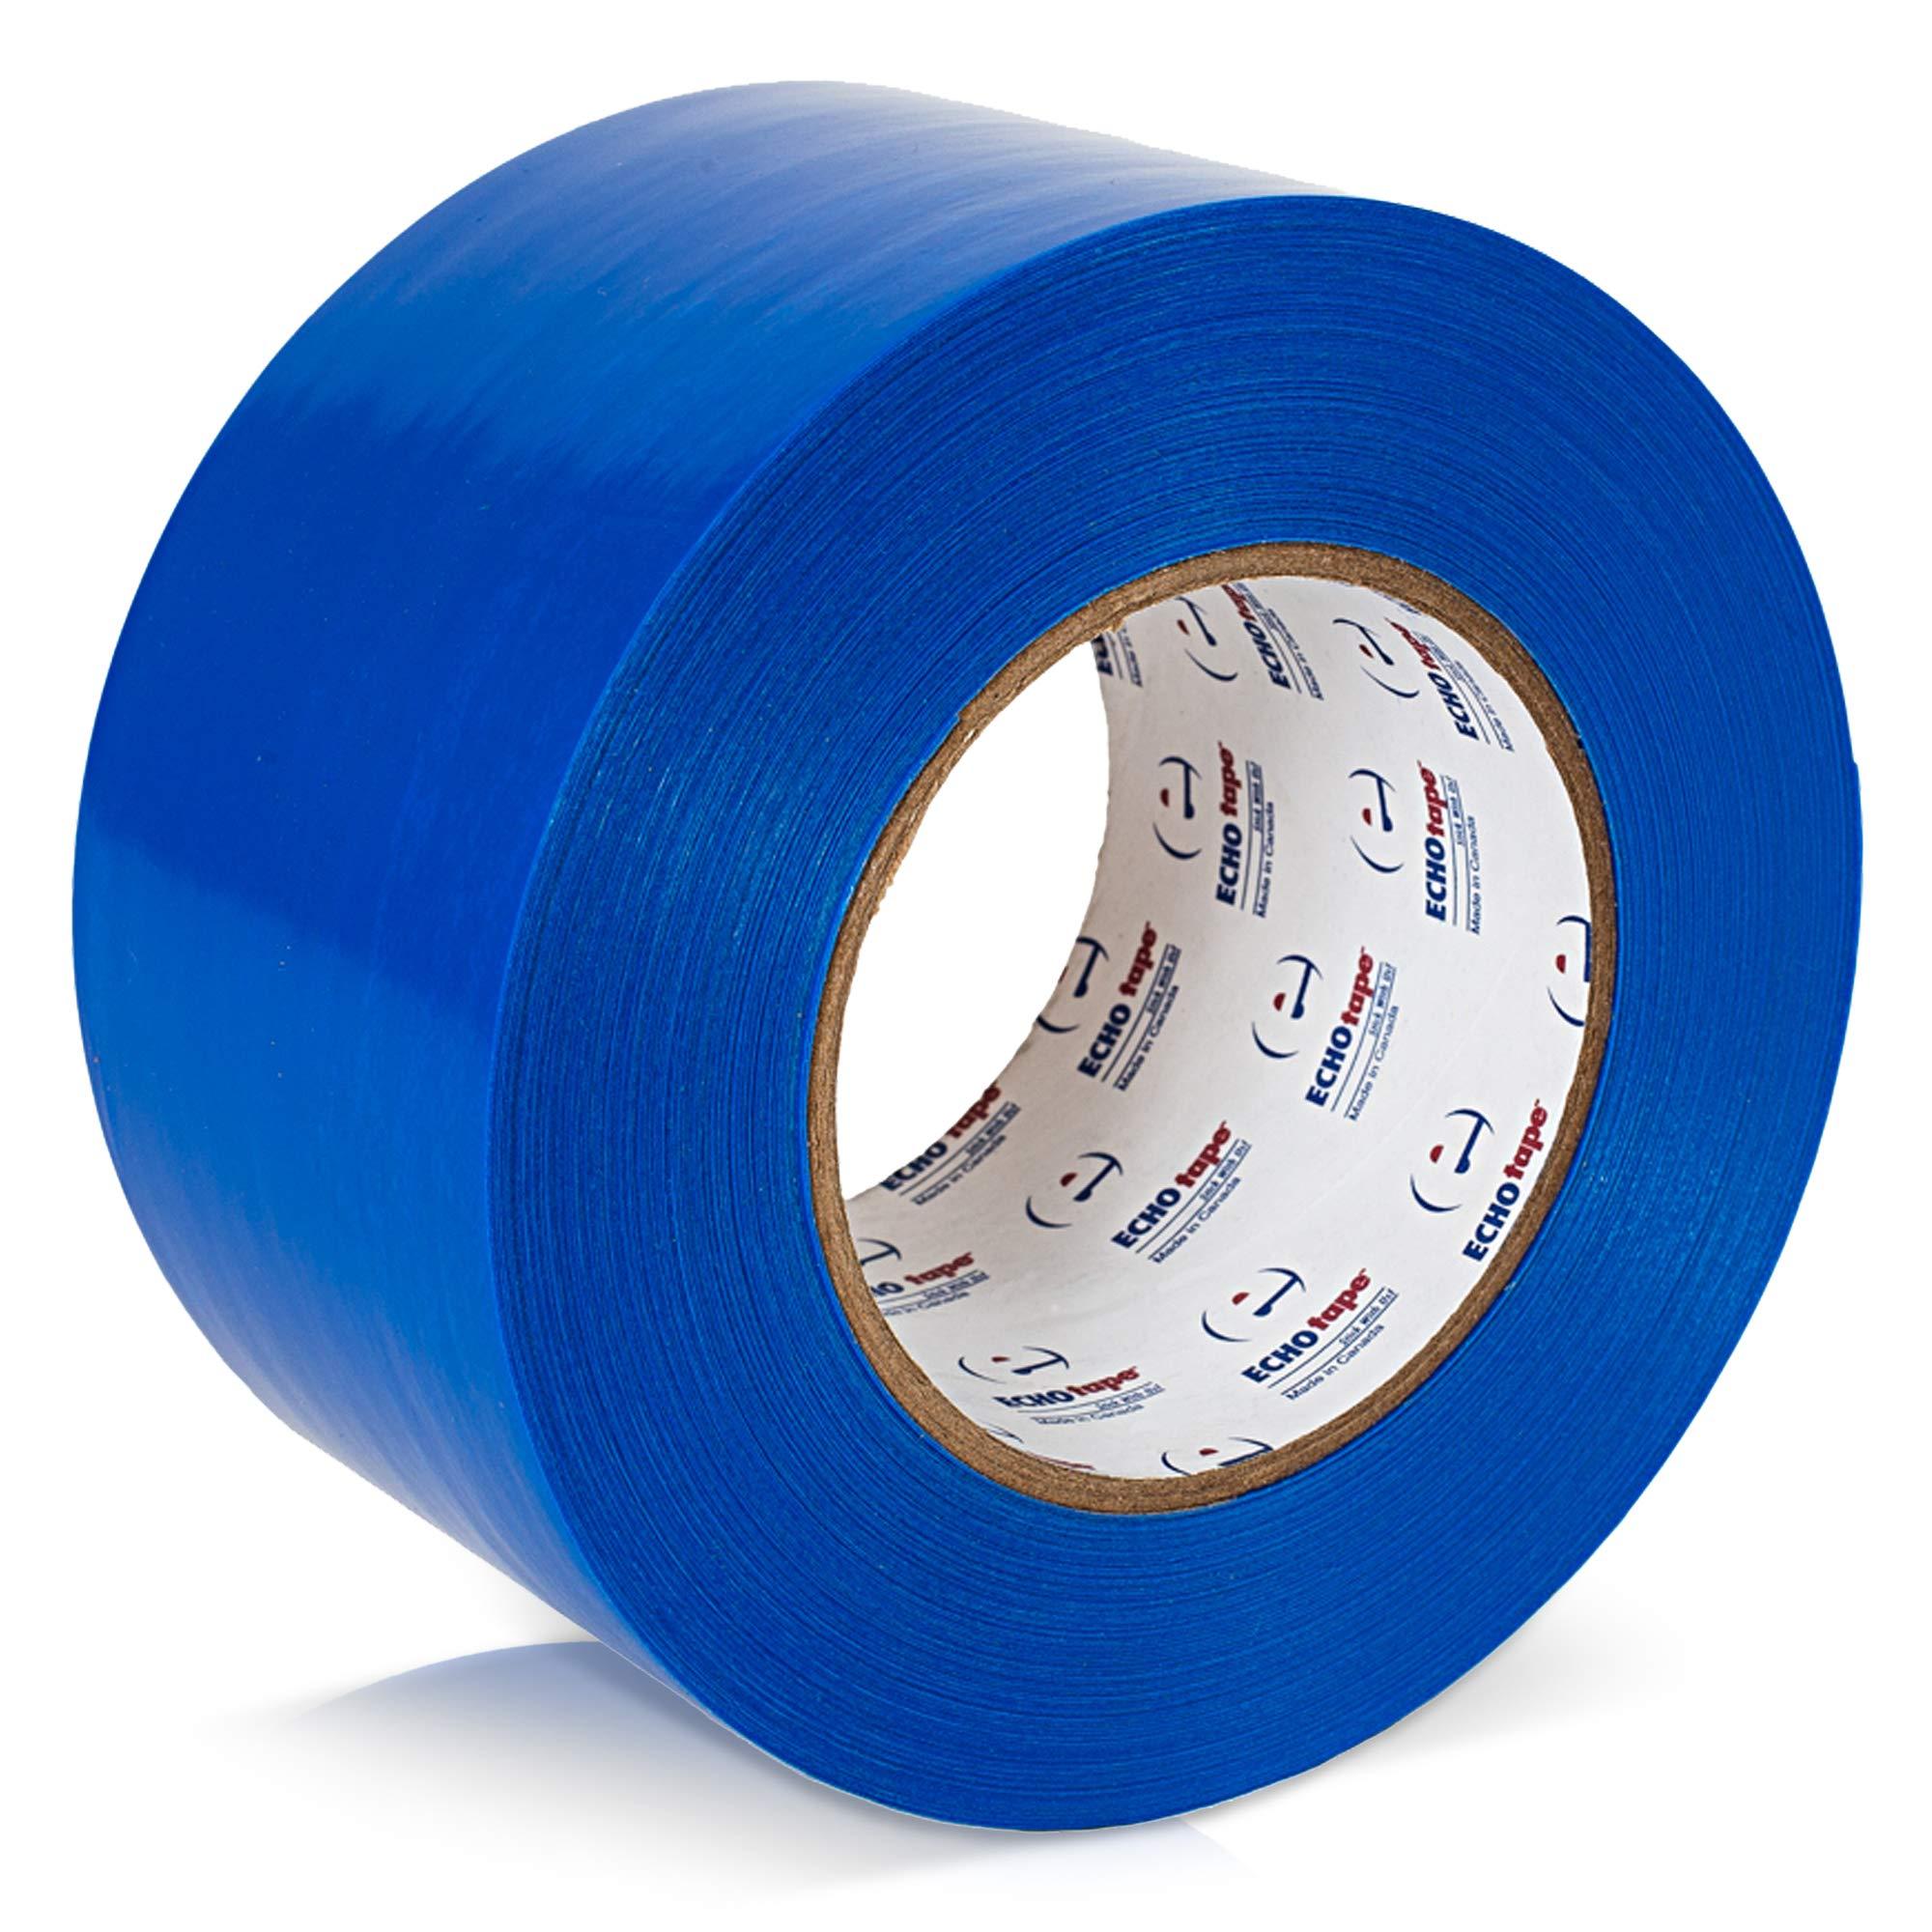 ECHOtape VI-N6120 Multi Purpose No Residue Polyethylene Vinyl Tape | Multi Purpose Tape | No Residue Masking Tape for Windows & Doors | High Performance Adhesive Tape| Stucco Contractors Tape